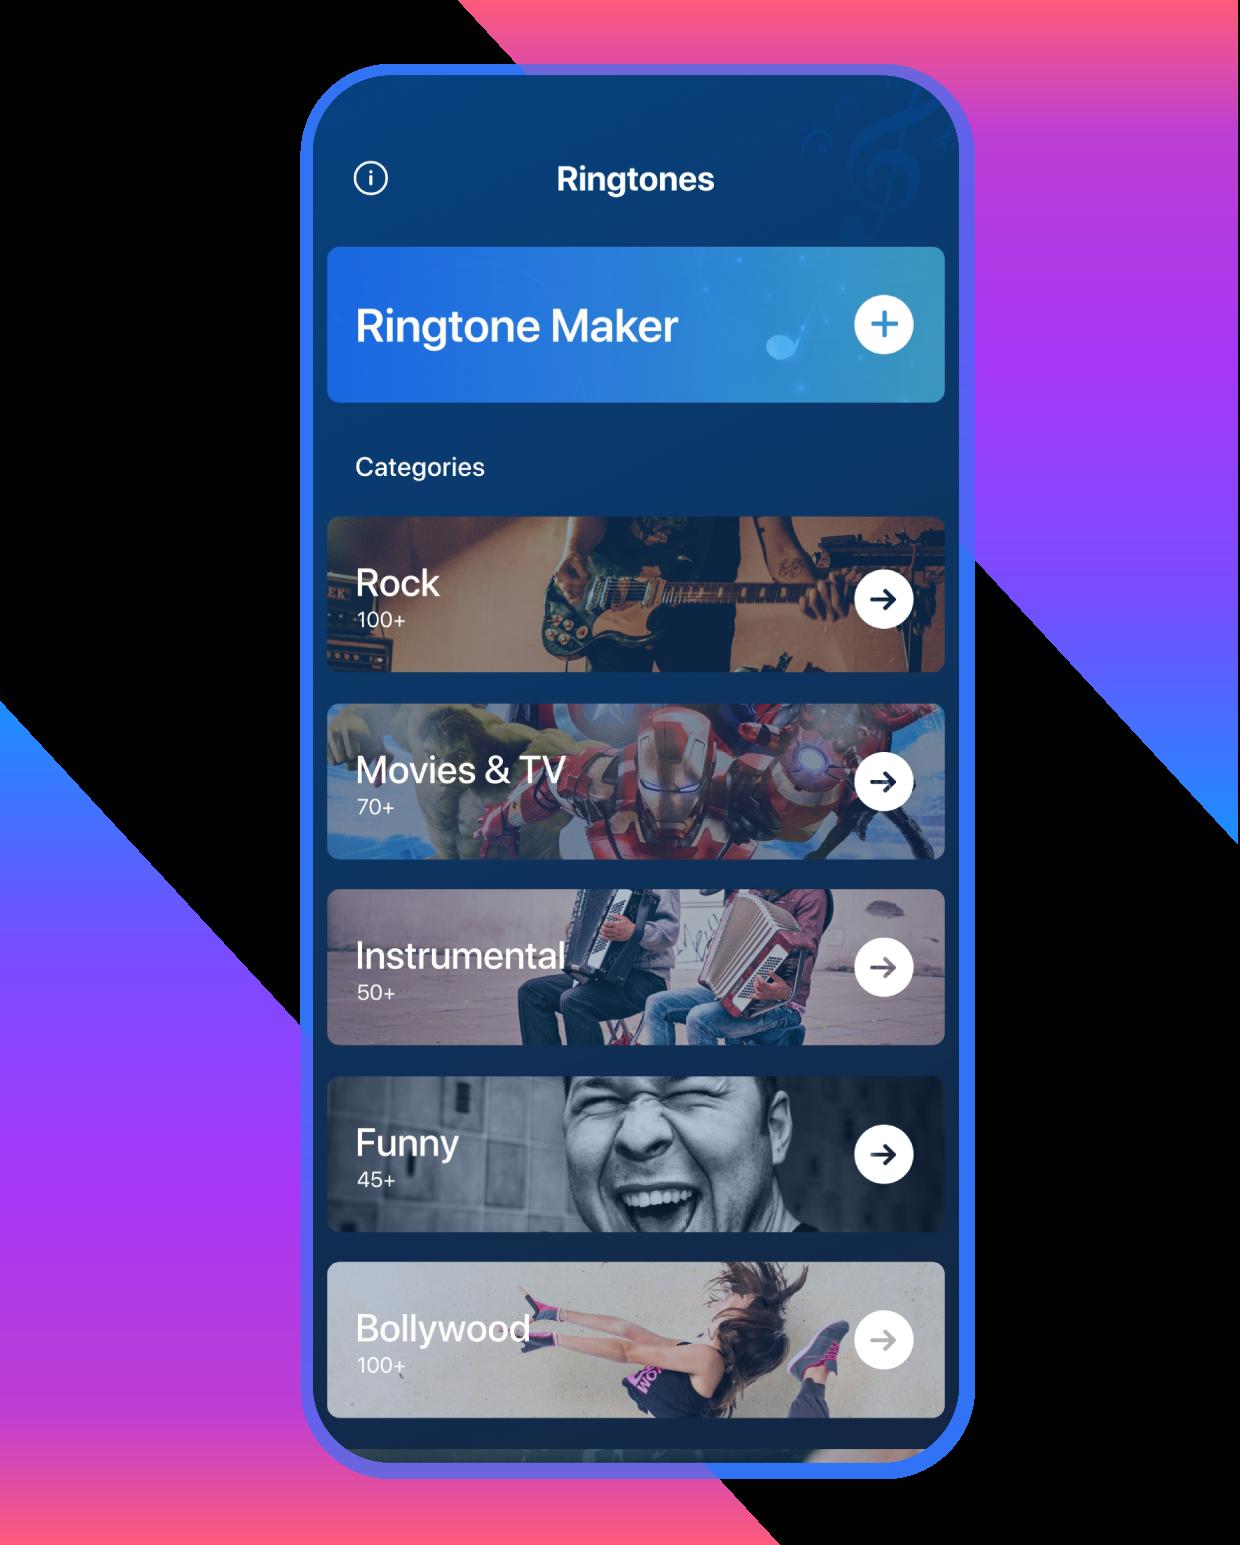 Ringtone categories of Ringtone Maker App